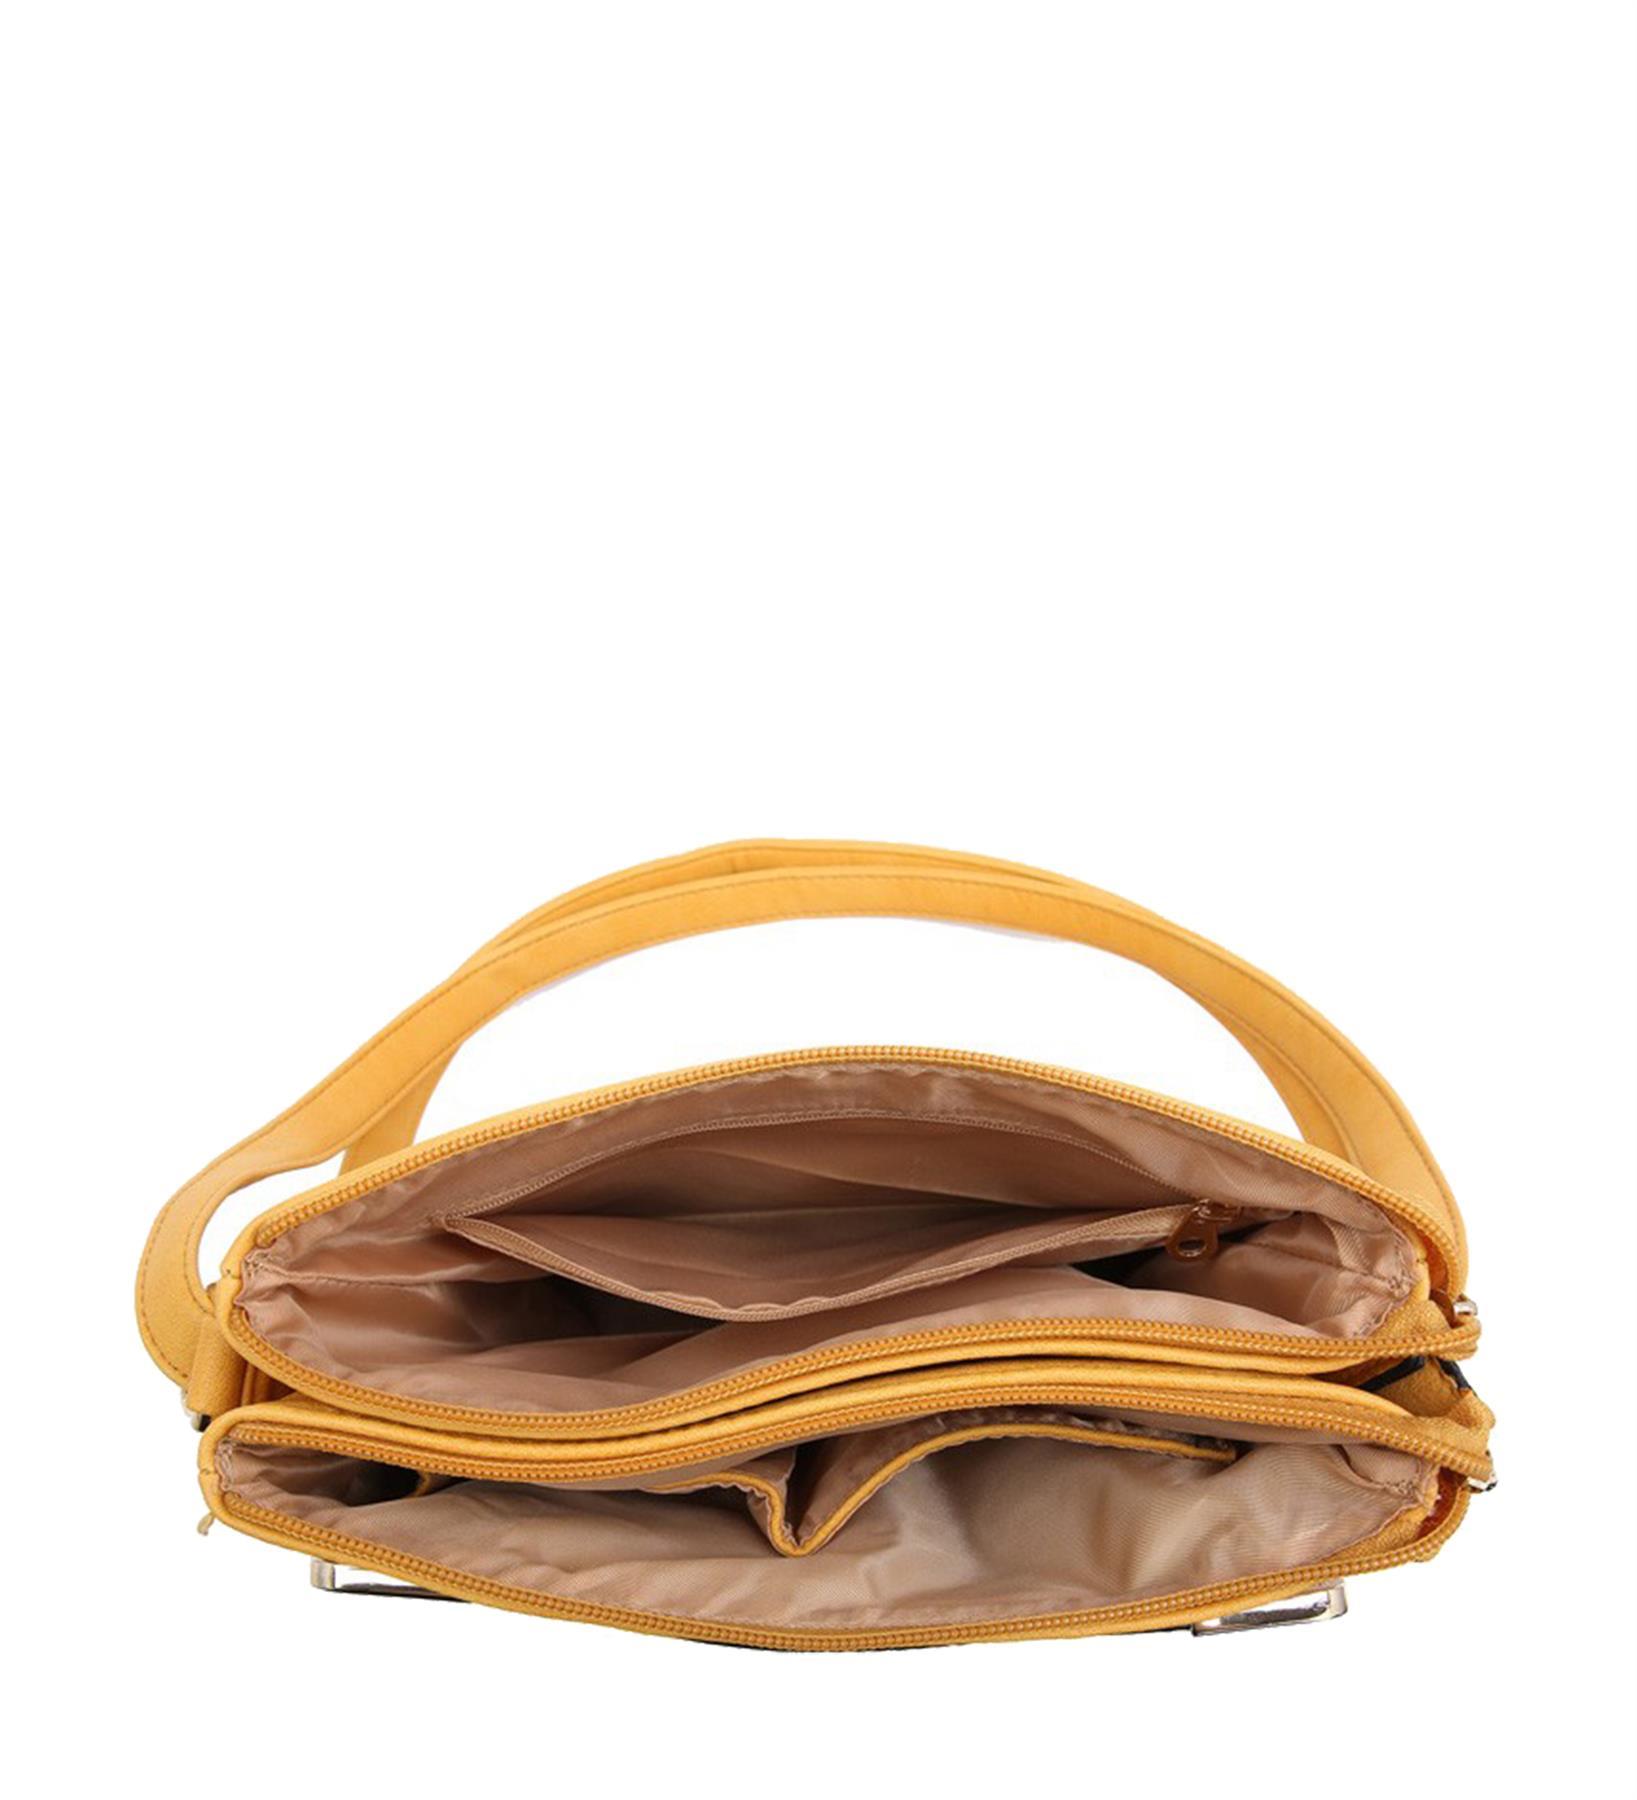 New-Casual-Ladies-Multi-Pocket-Metallic-Detail-Adjustable-Crossbody-Bag thumbnail 10